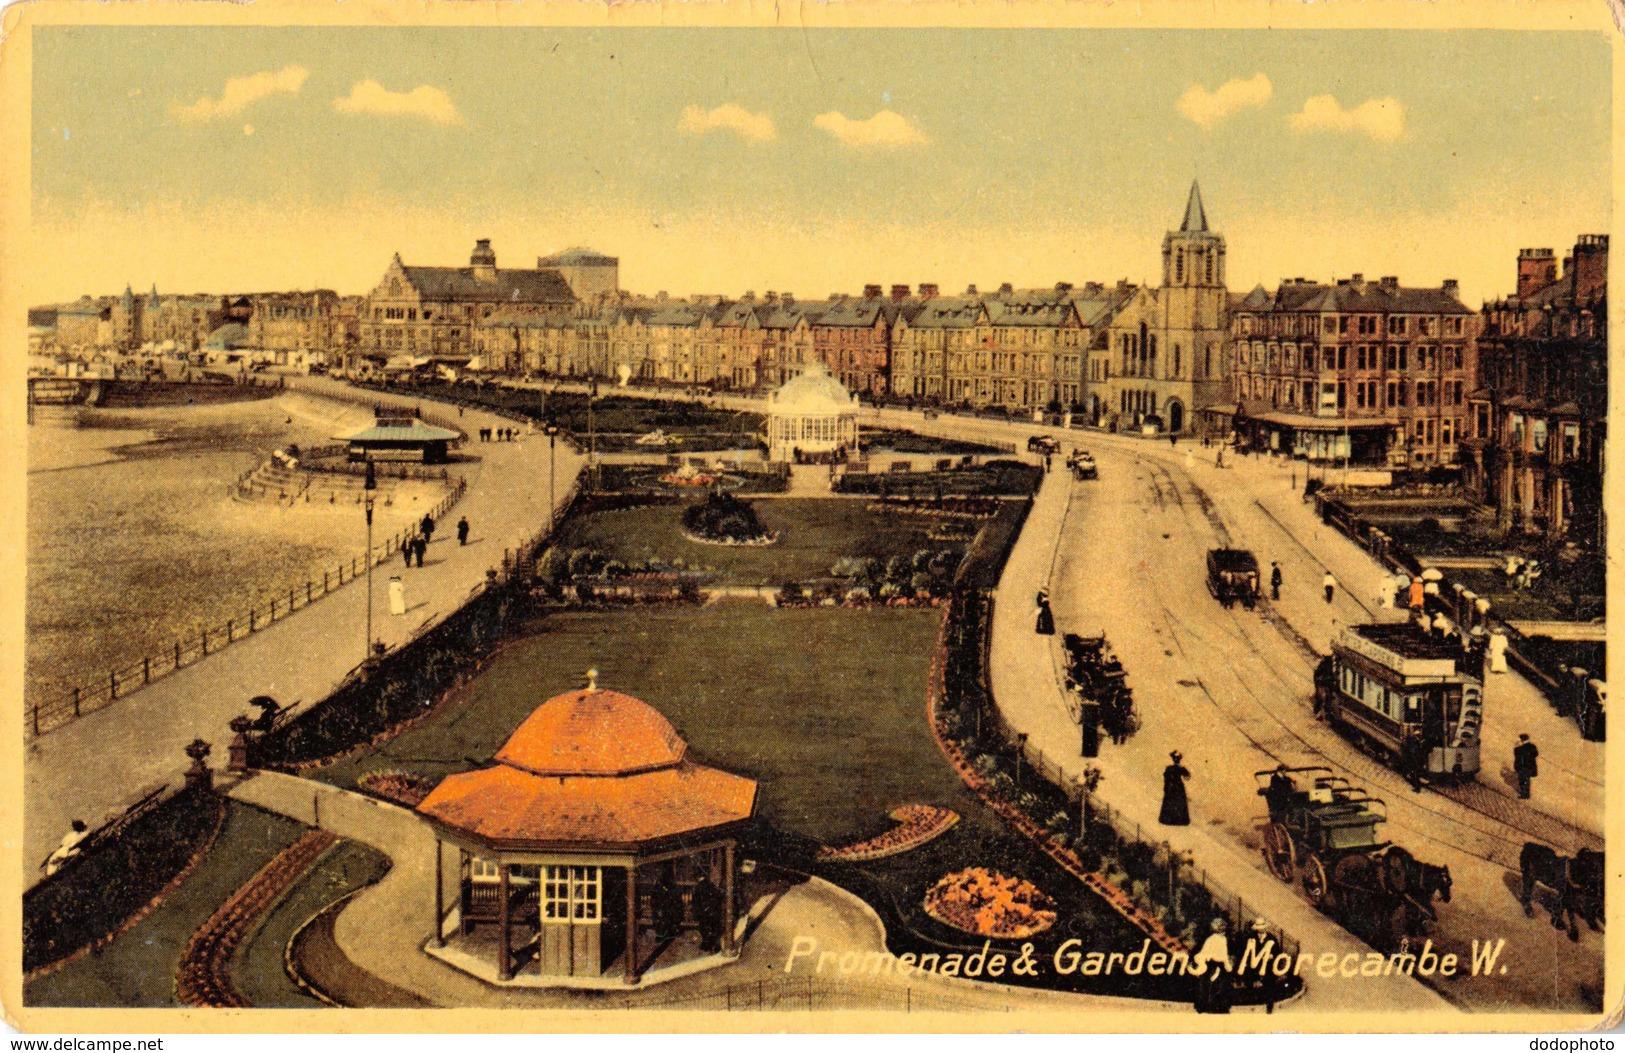 R097892 Promenade And Gardens. Morecambe W - Cartes Postales